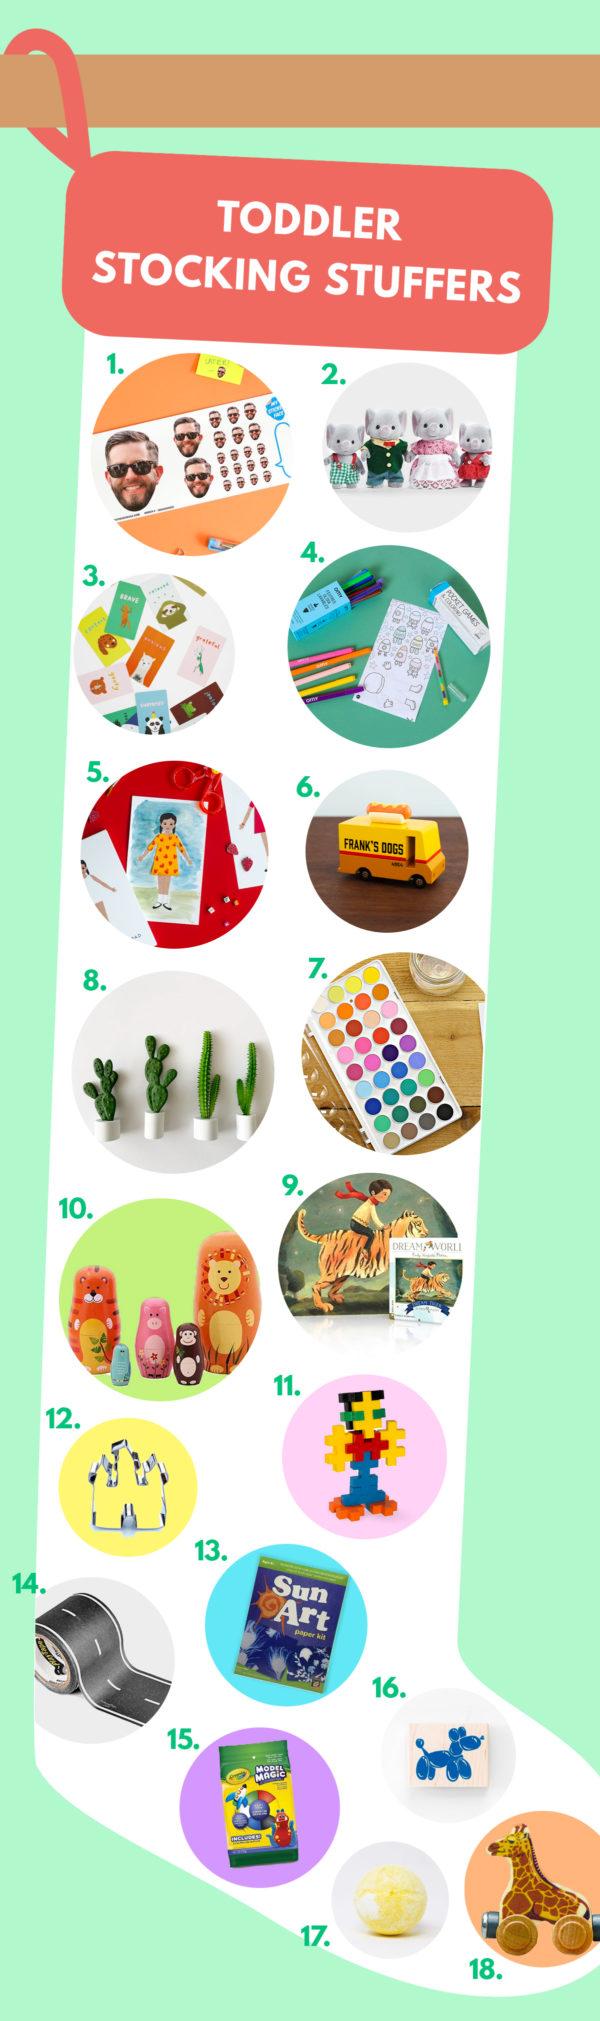 Toddler Stocking Stuffer Ideas